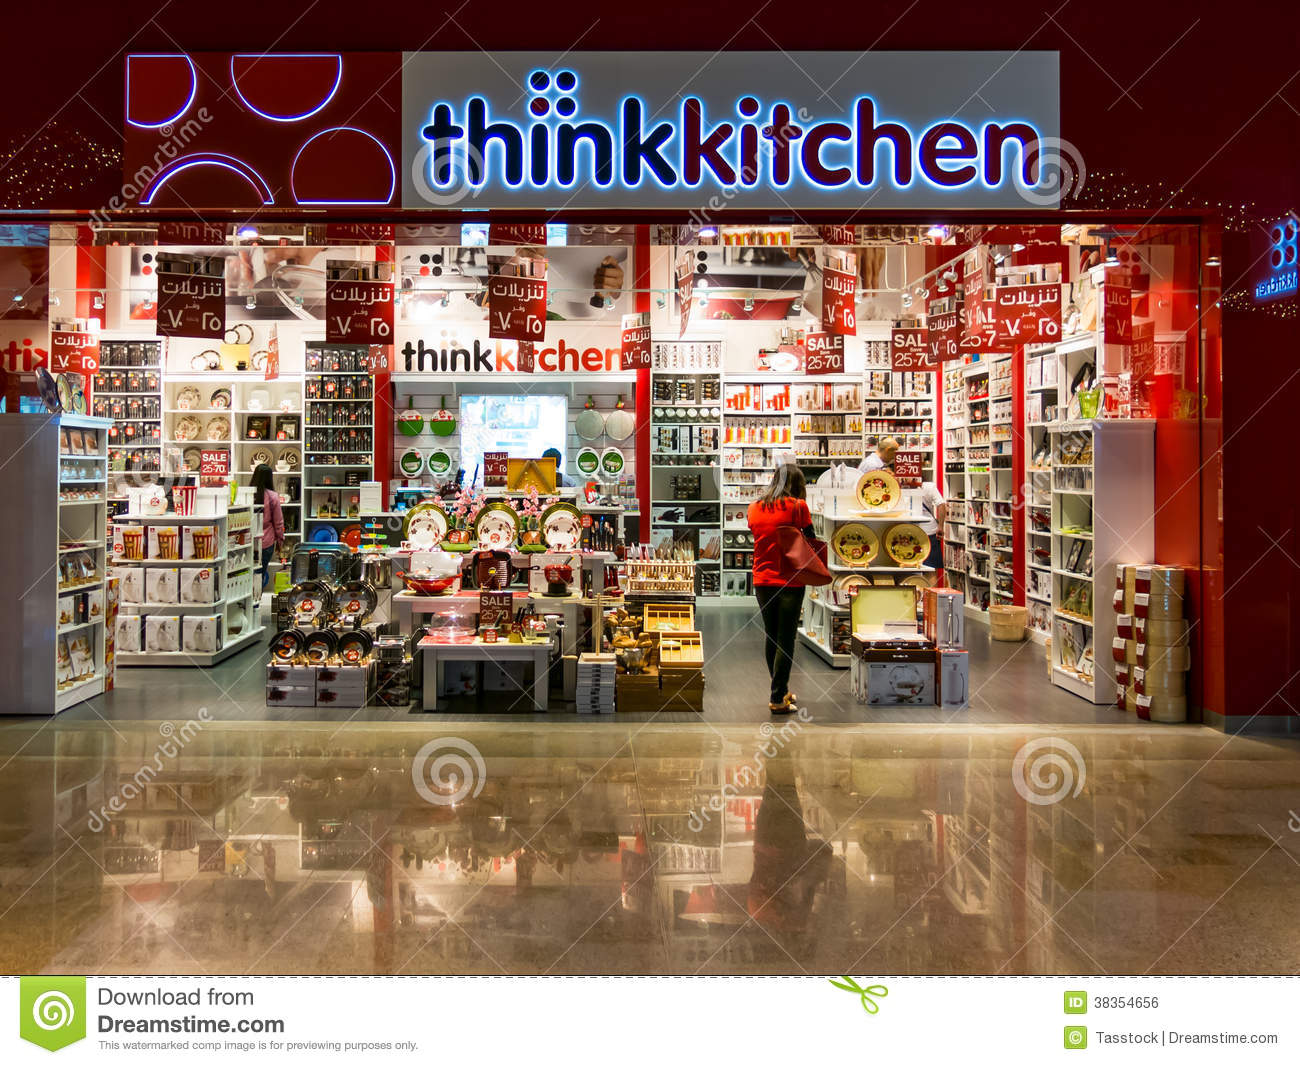 think kitchen dubai shopping guide - Think Kitchen